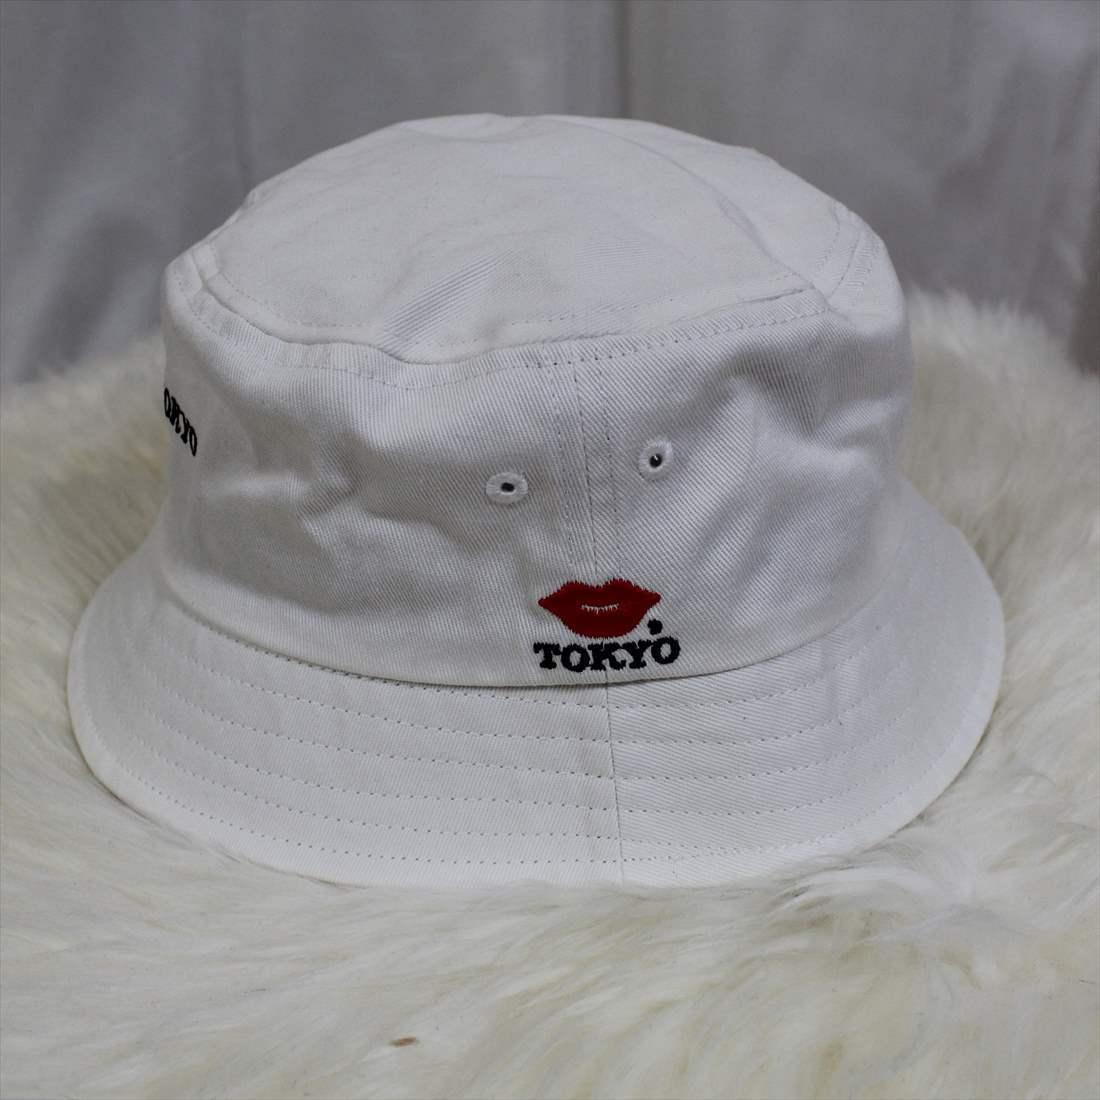 KISS TOKYO LIP LOGO HAT ロゴ刺繍 ホワイト ハット 新品 白 帽子_画像2